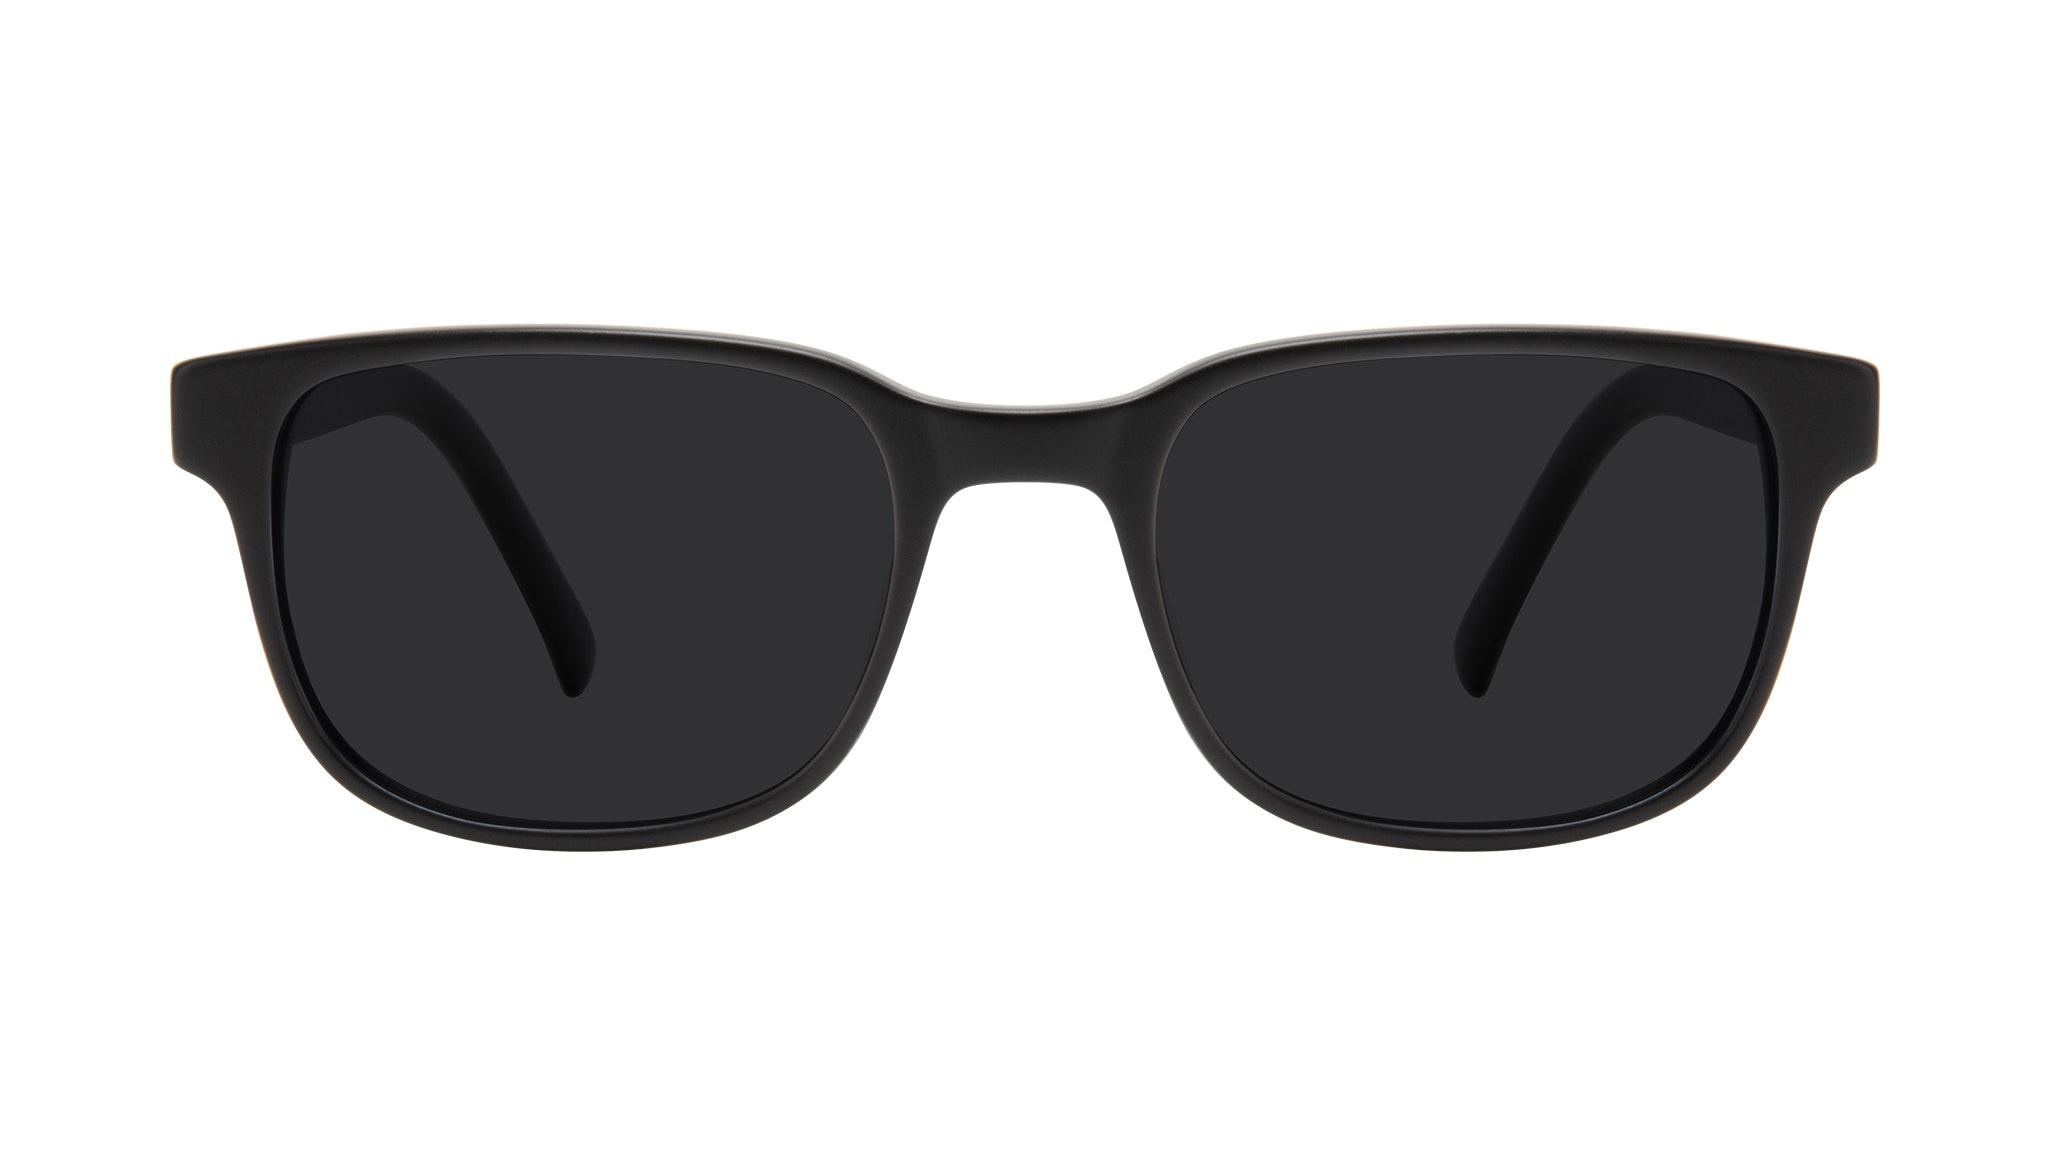 Affordable Fashion Glasses Square Sunglasses Men Role Black Matte Front